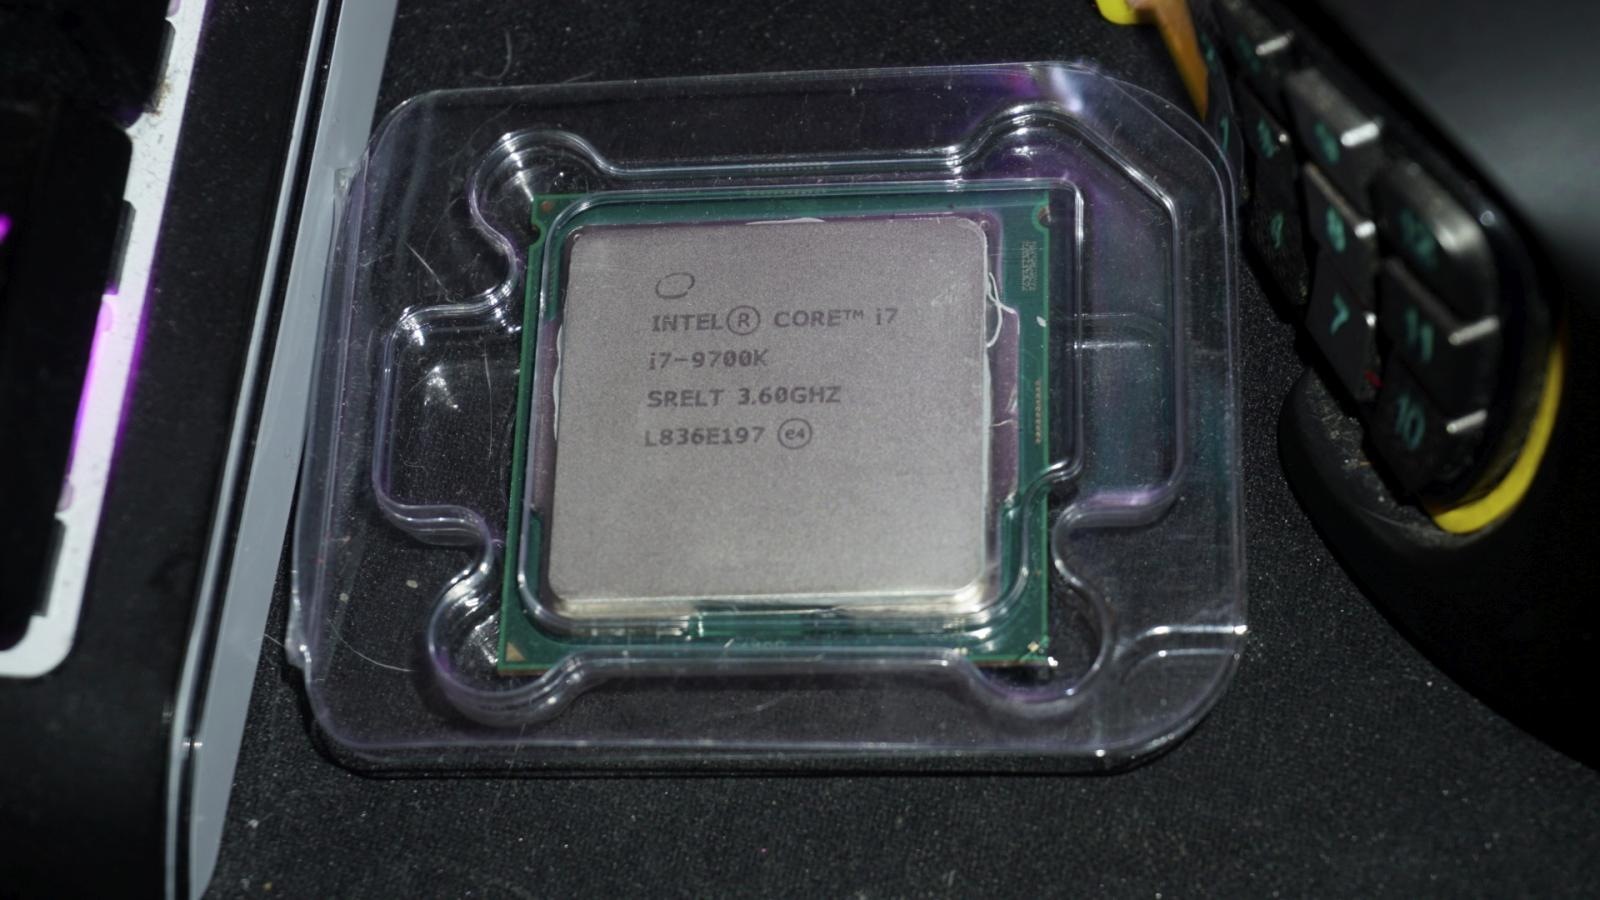 Photo of Intel i7-9700k